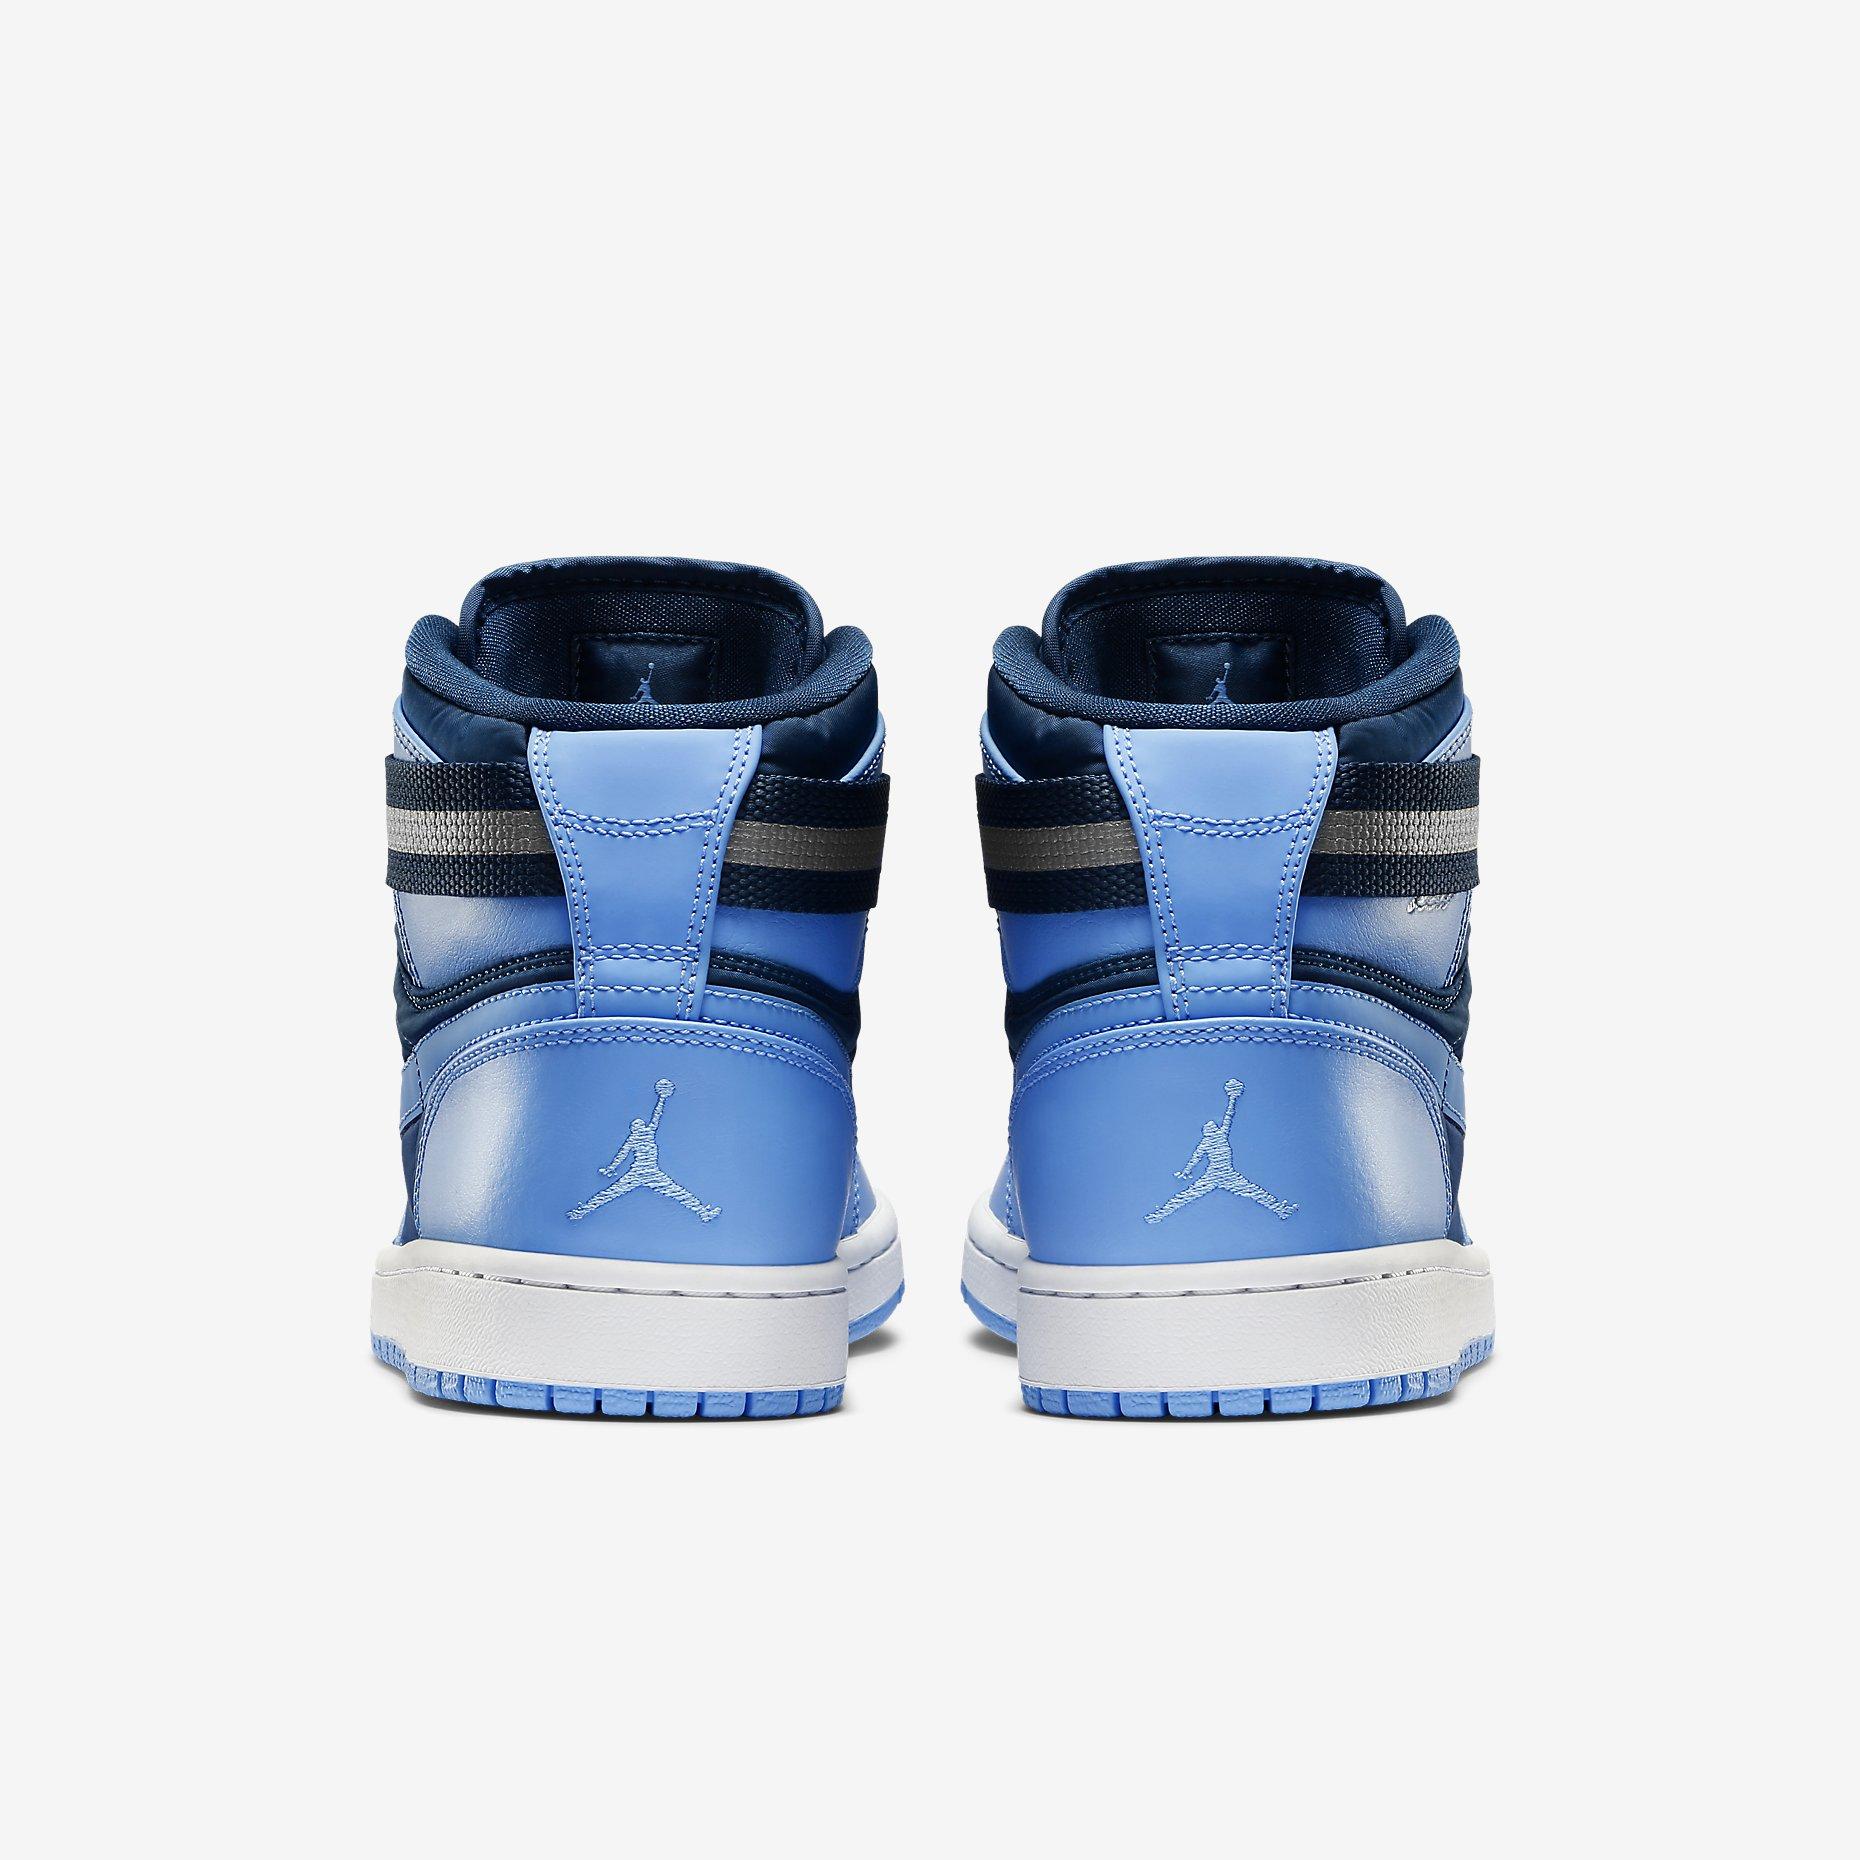 sale retailer 3836a 98f41 Price   125.00. Nike Air Jordan 1 High Strap French Blue University Blue  342132-407 Sizes 9